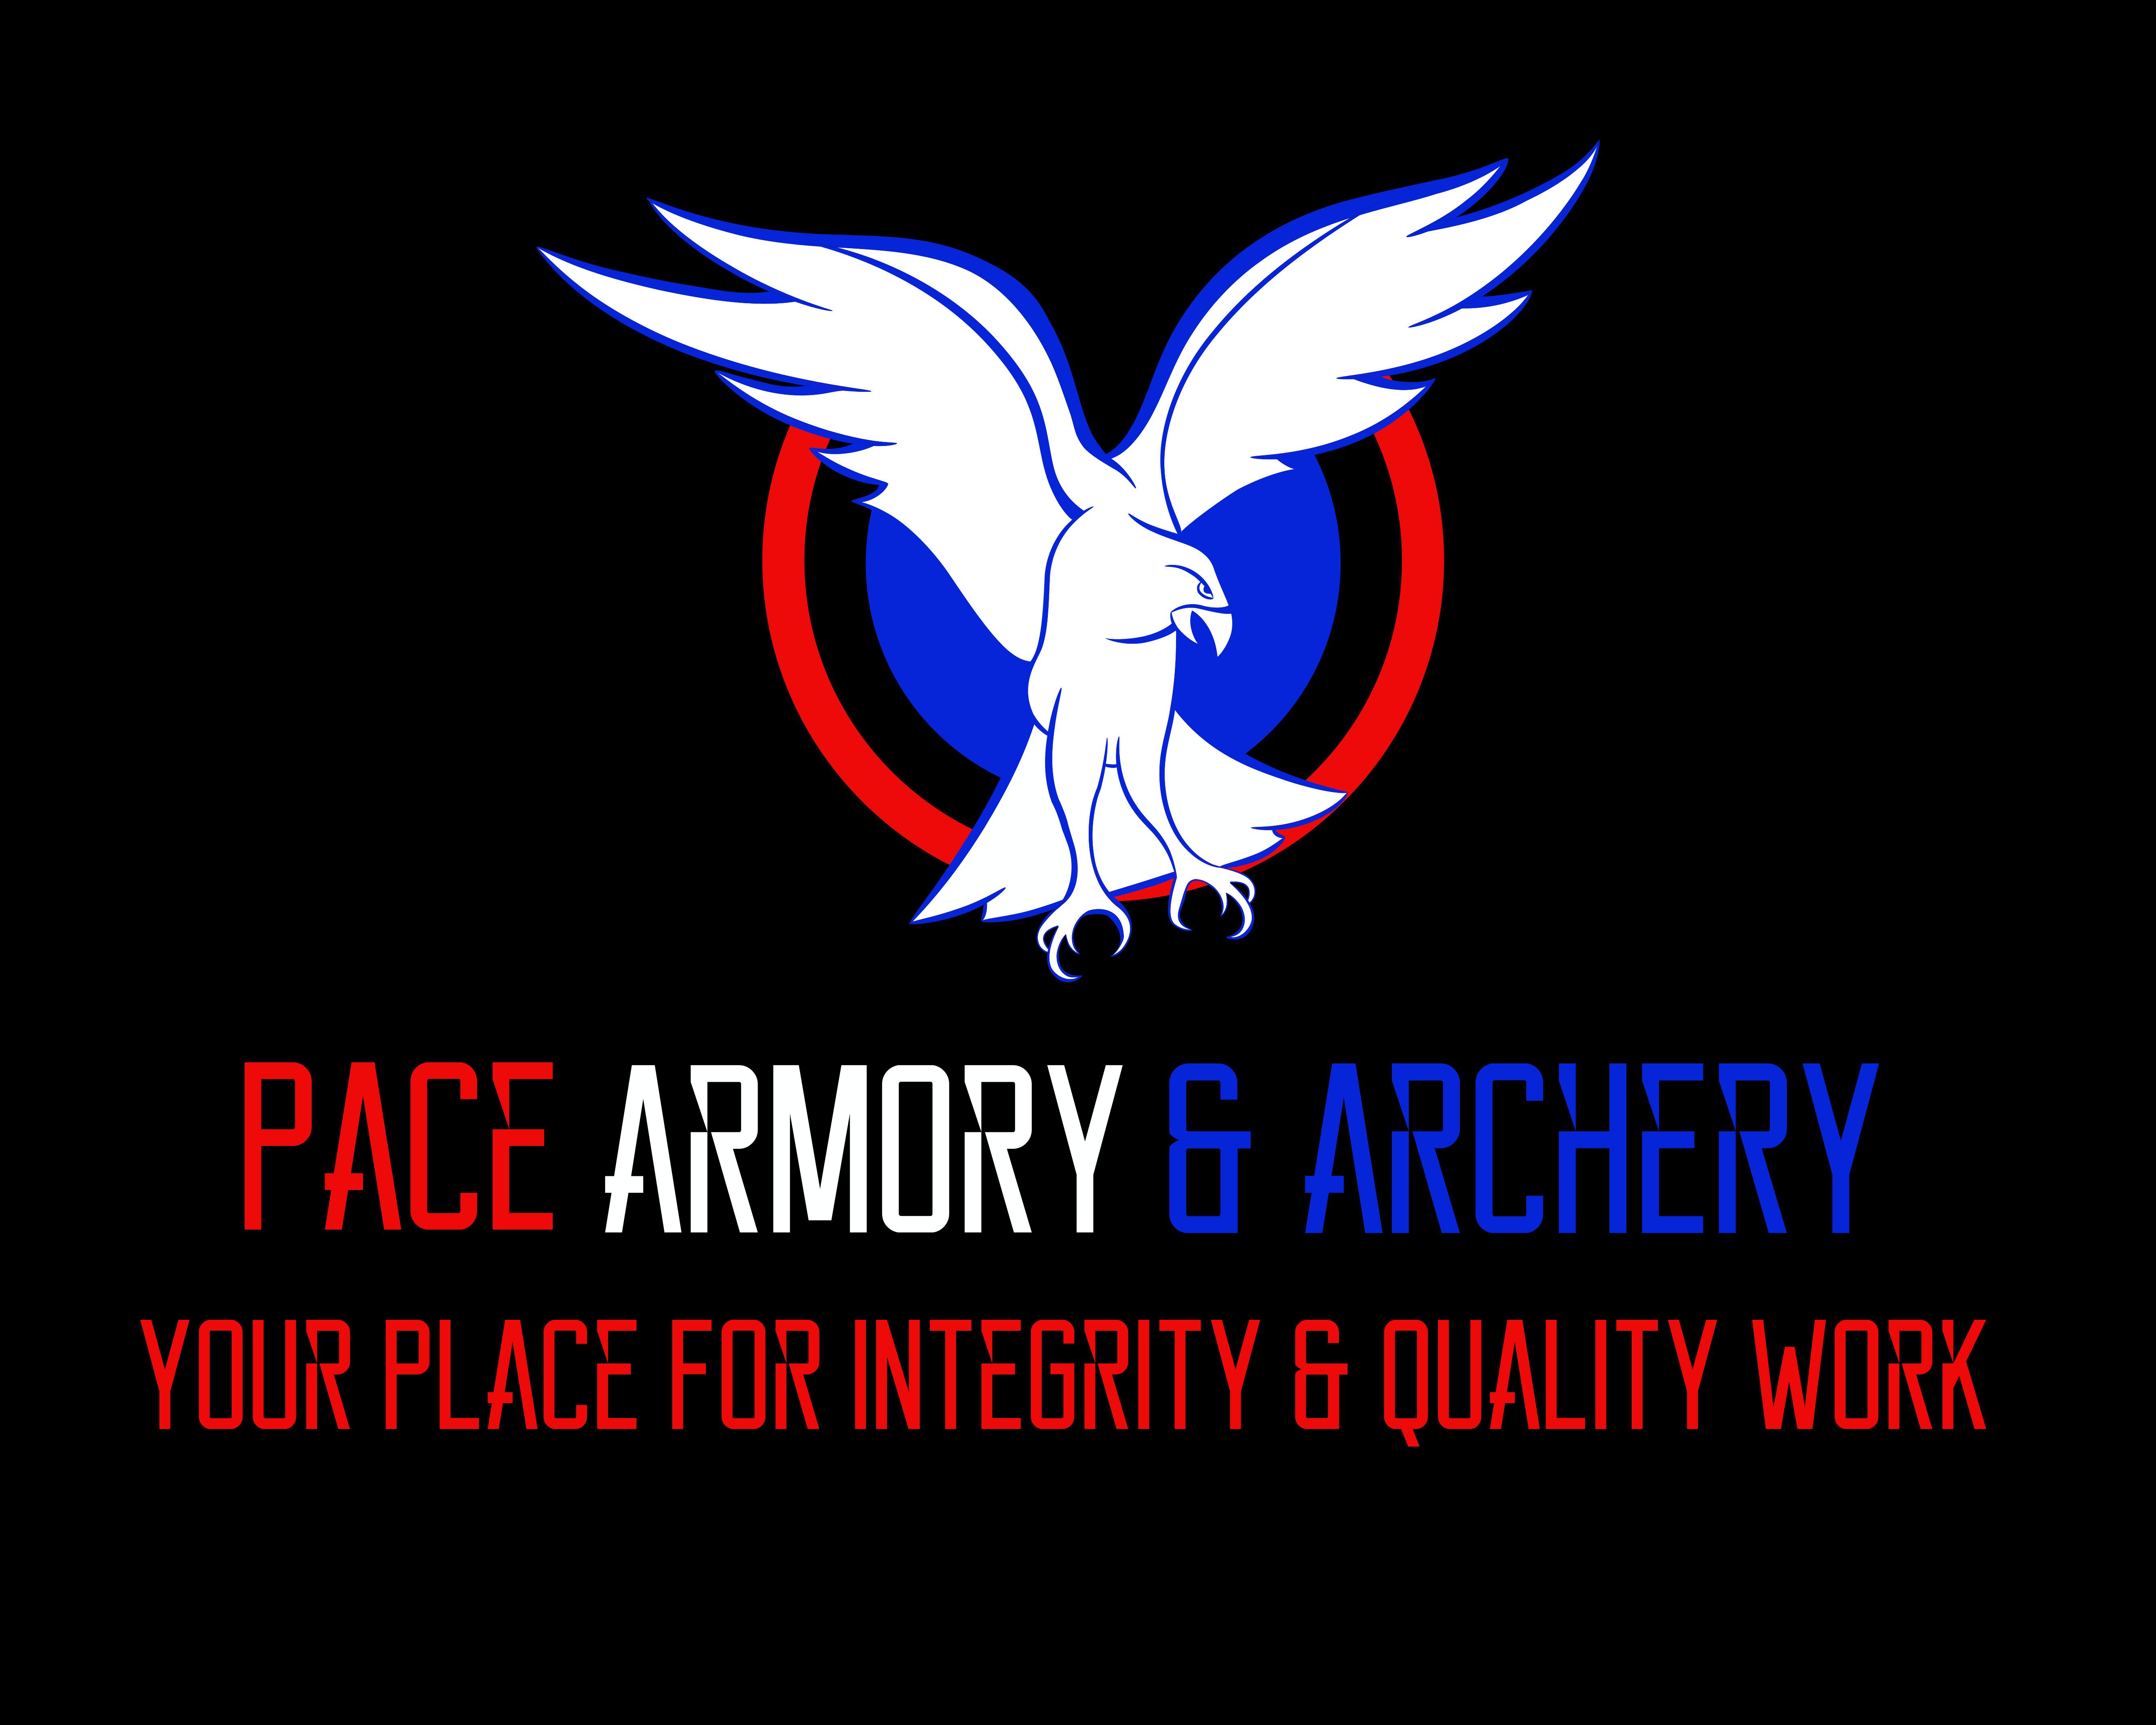 Pace Armory & Archery